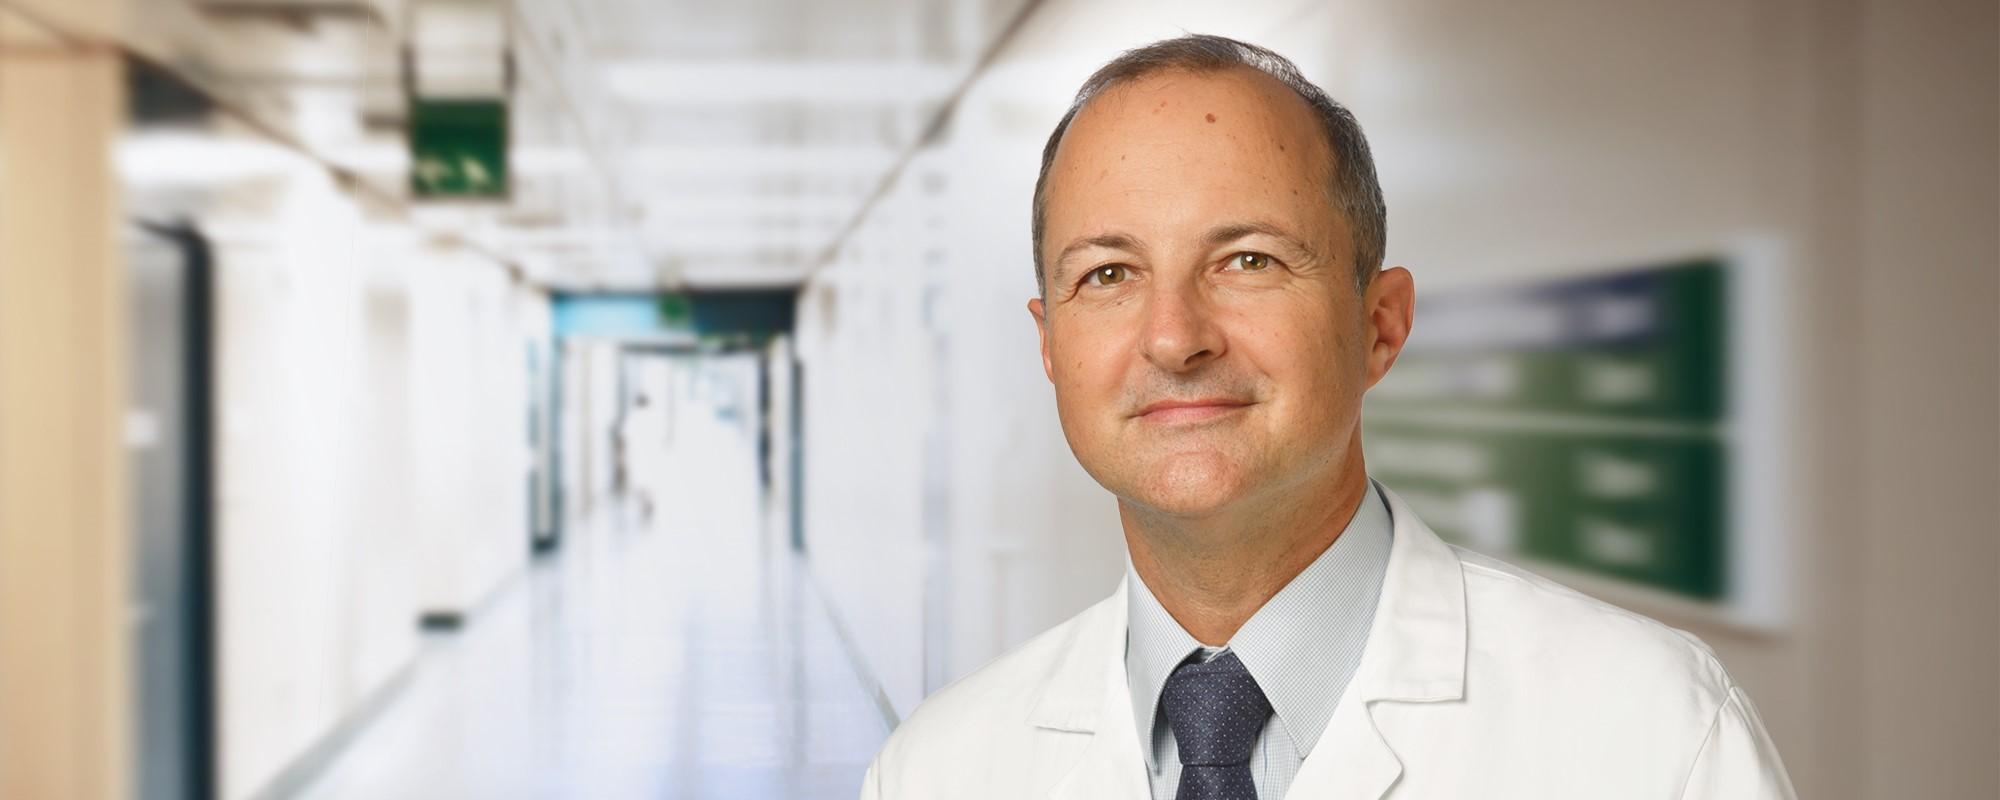 assoc. Prof. Priv. Doz. Dr. <span>Markus Klinger</span> MBA, FEBVS